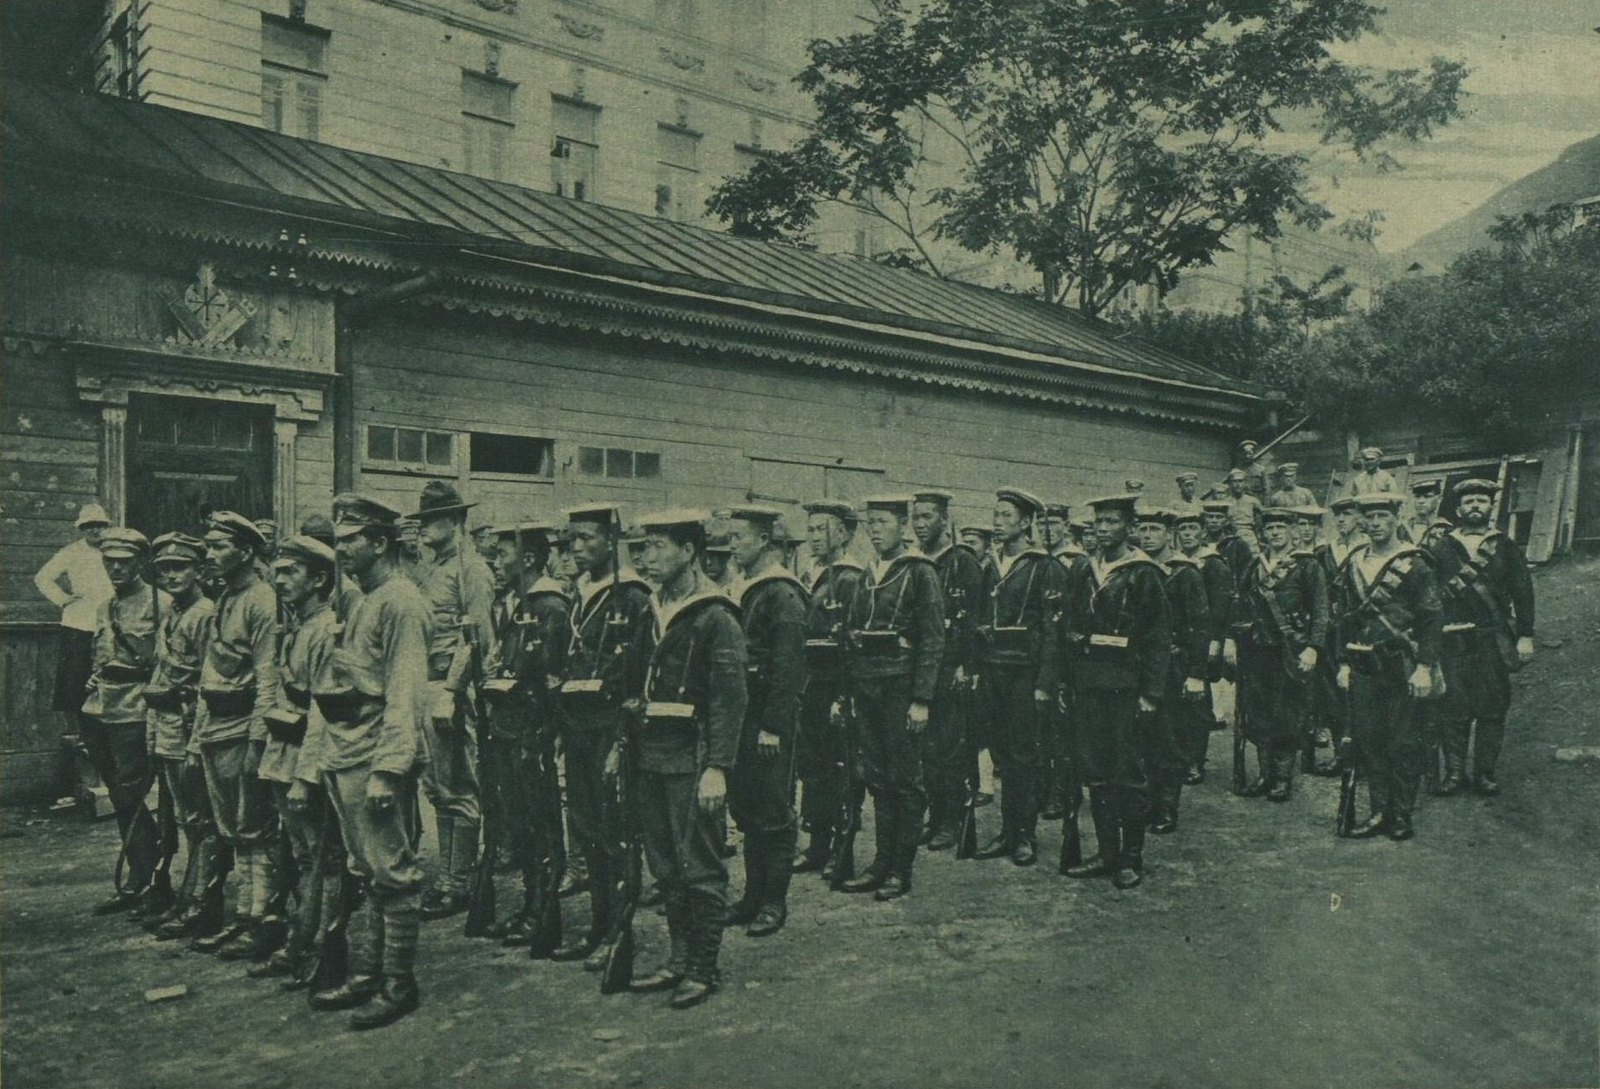 1918. Международная военная полиция (International Military Police)1